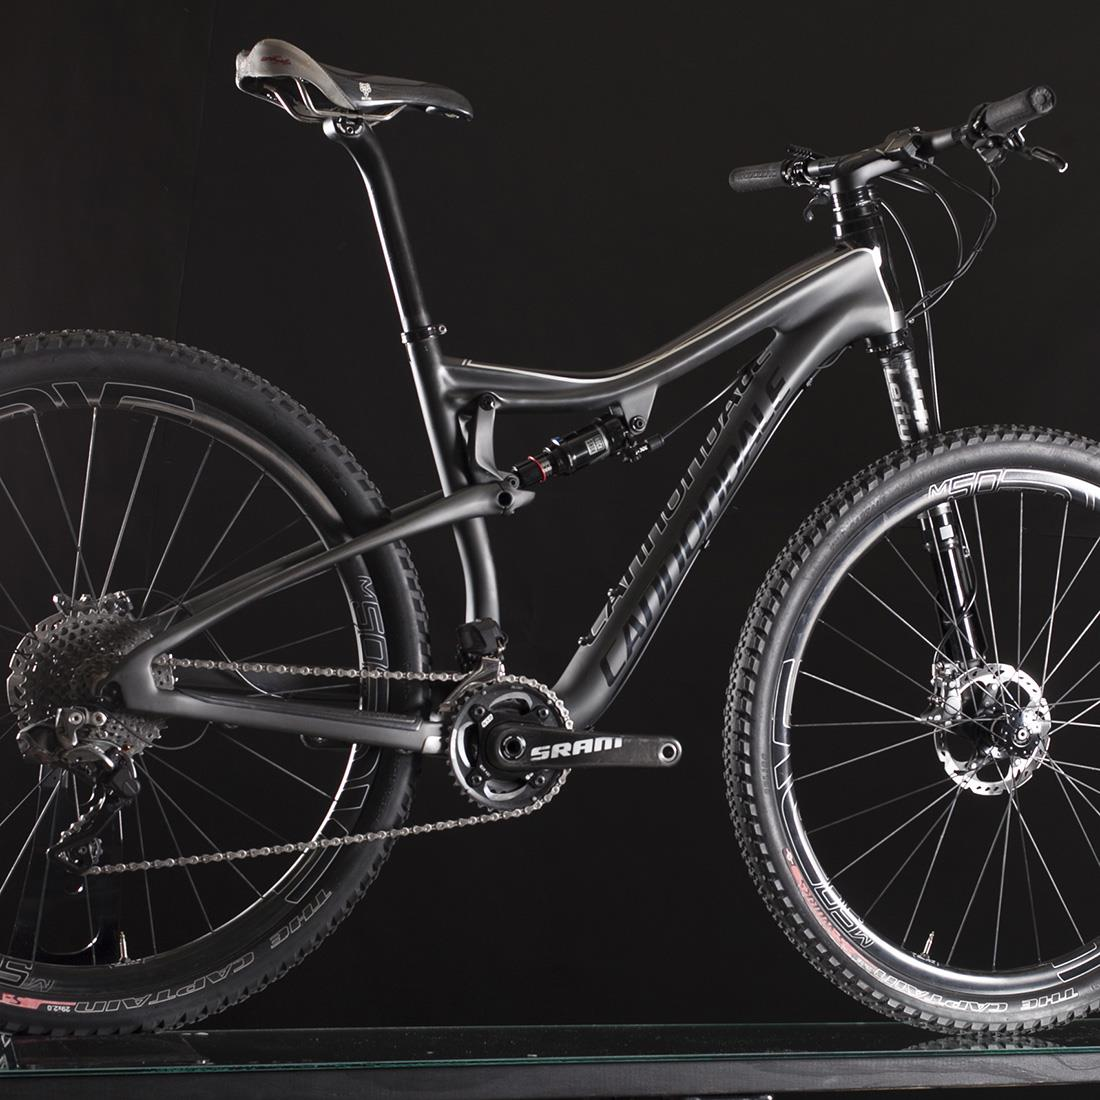 2015 Cannondale Scalpel-SI Black Inc. 29er XTR Di2 Carbon size MEDIUM ,NICE!